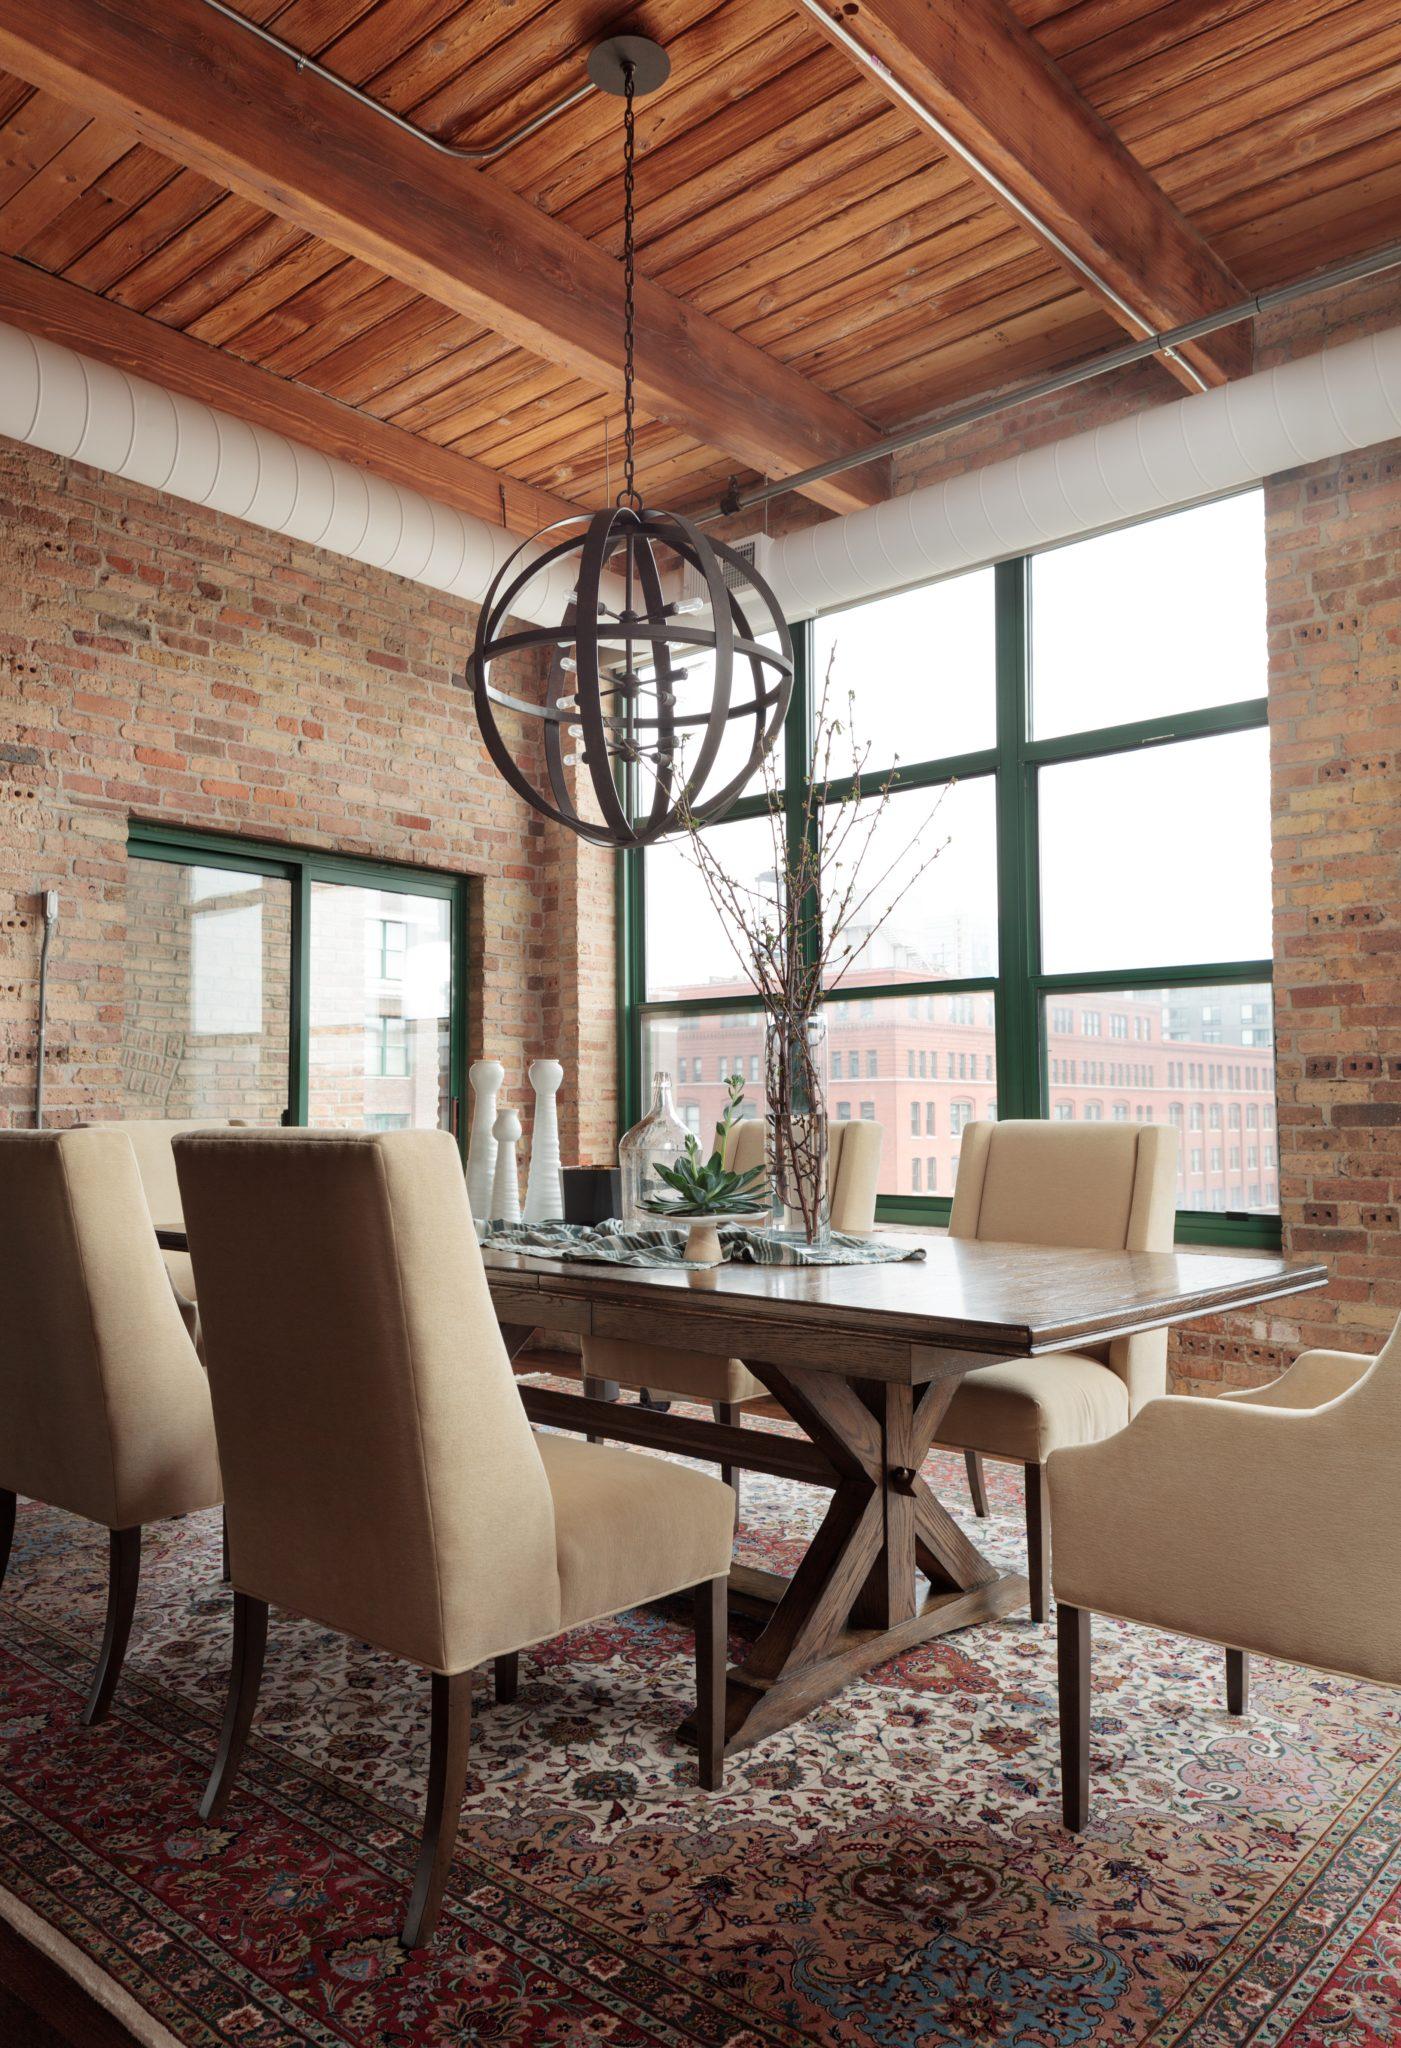 Interior design by CK Interior Design